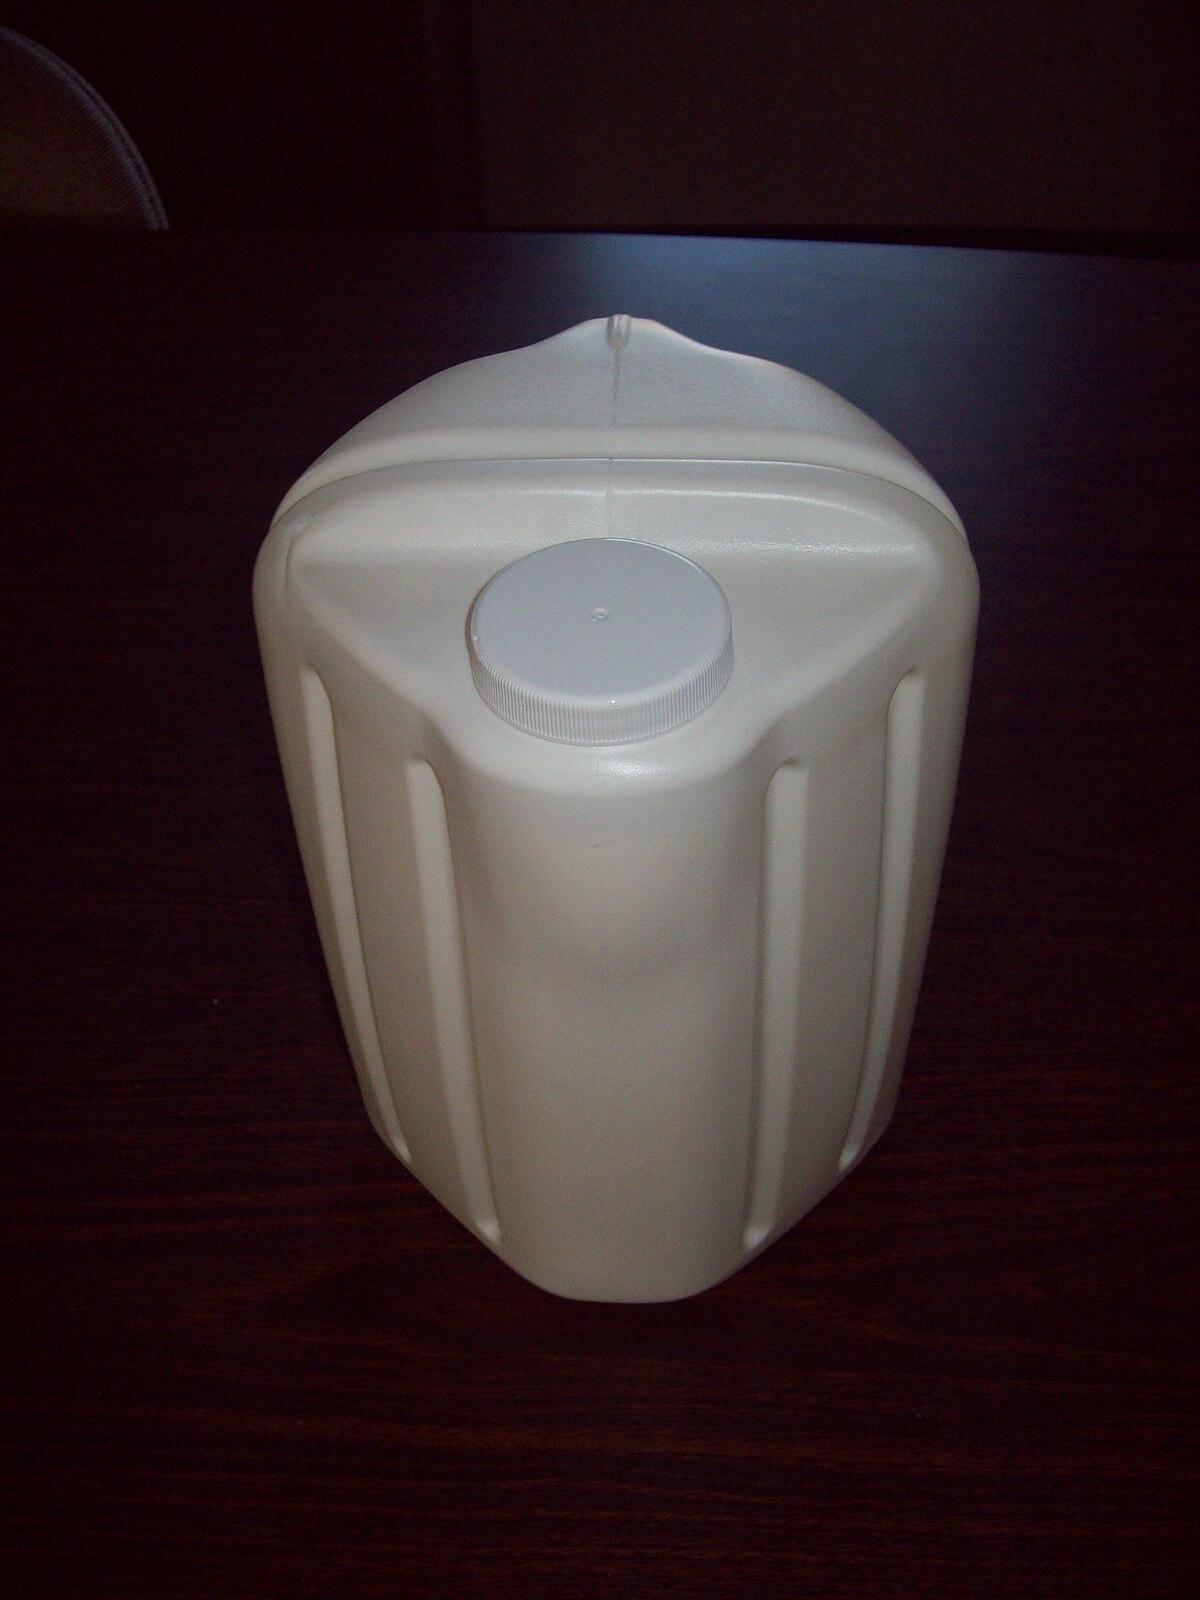 Square Milk Jug Wikipedia